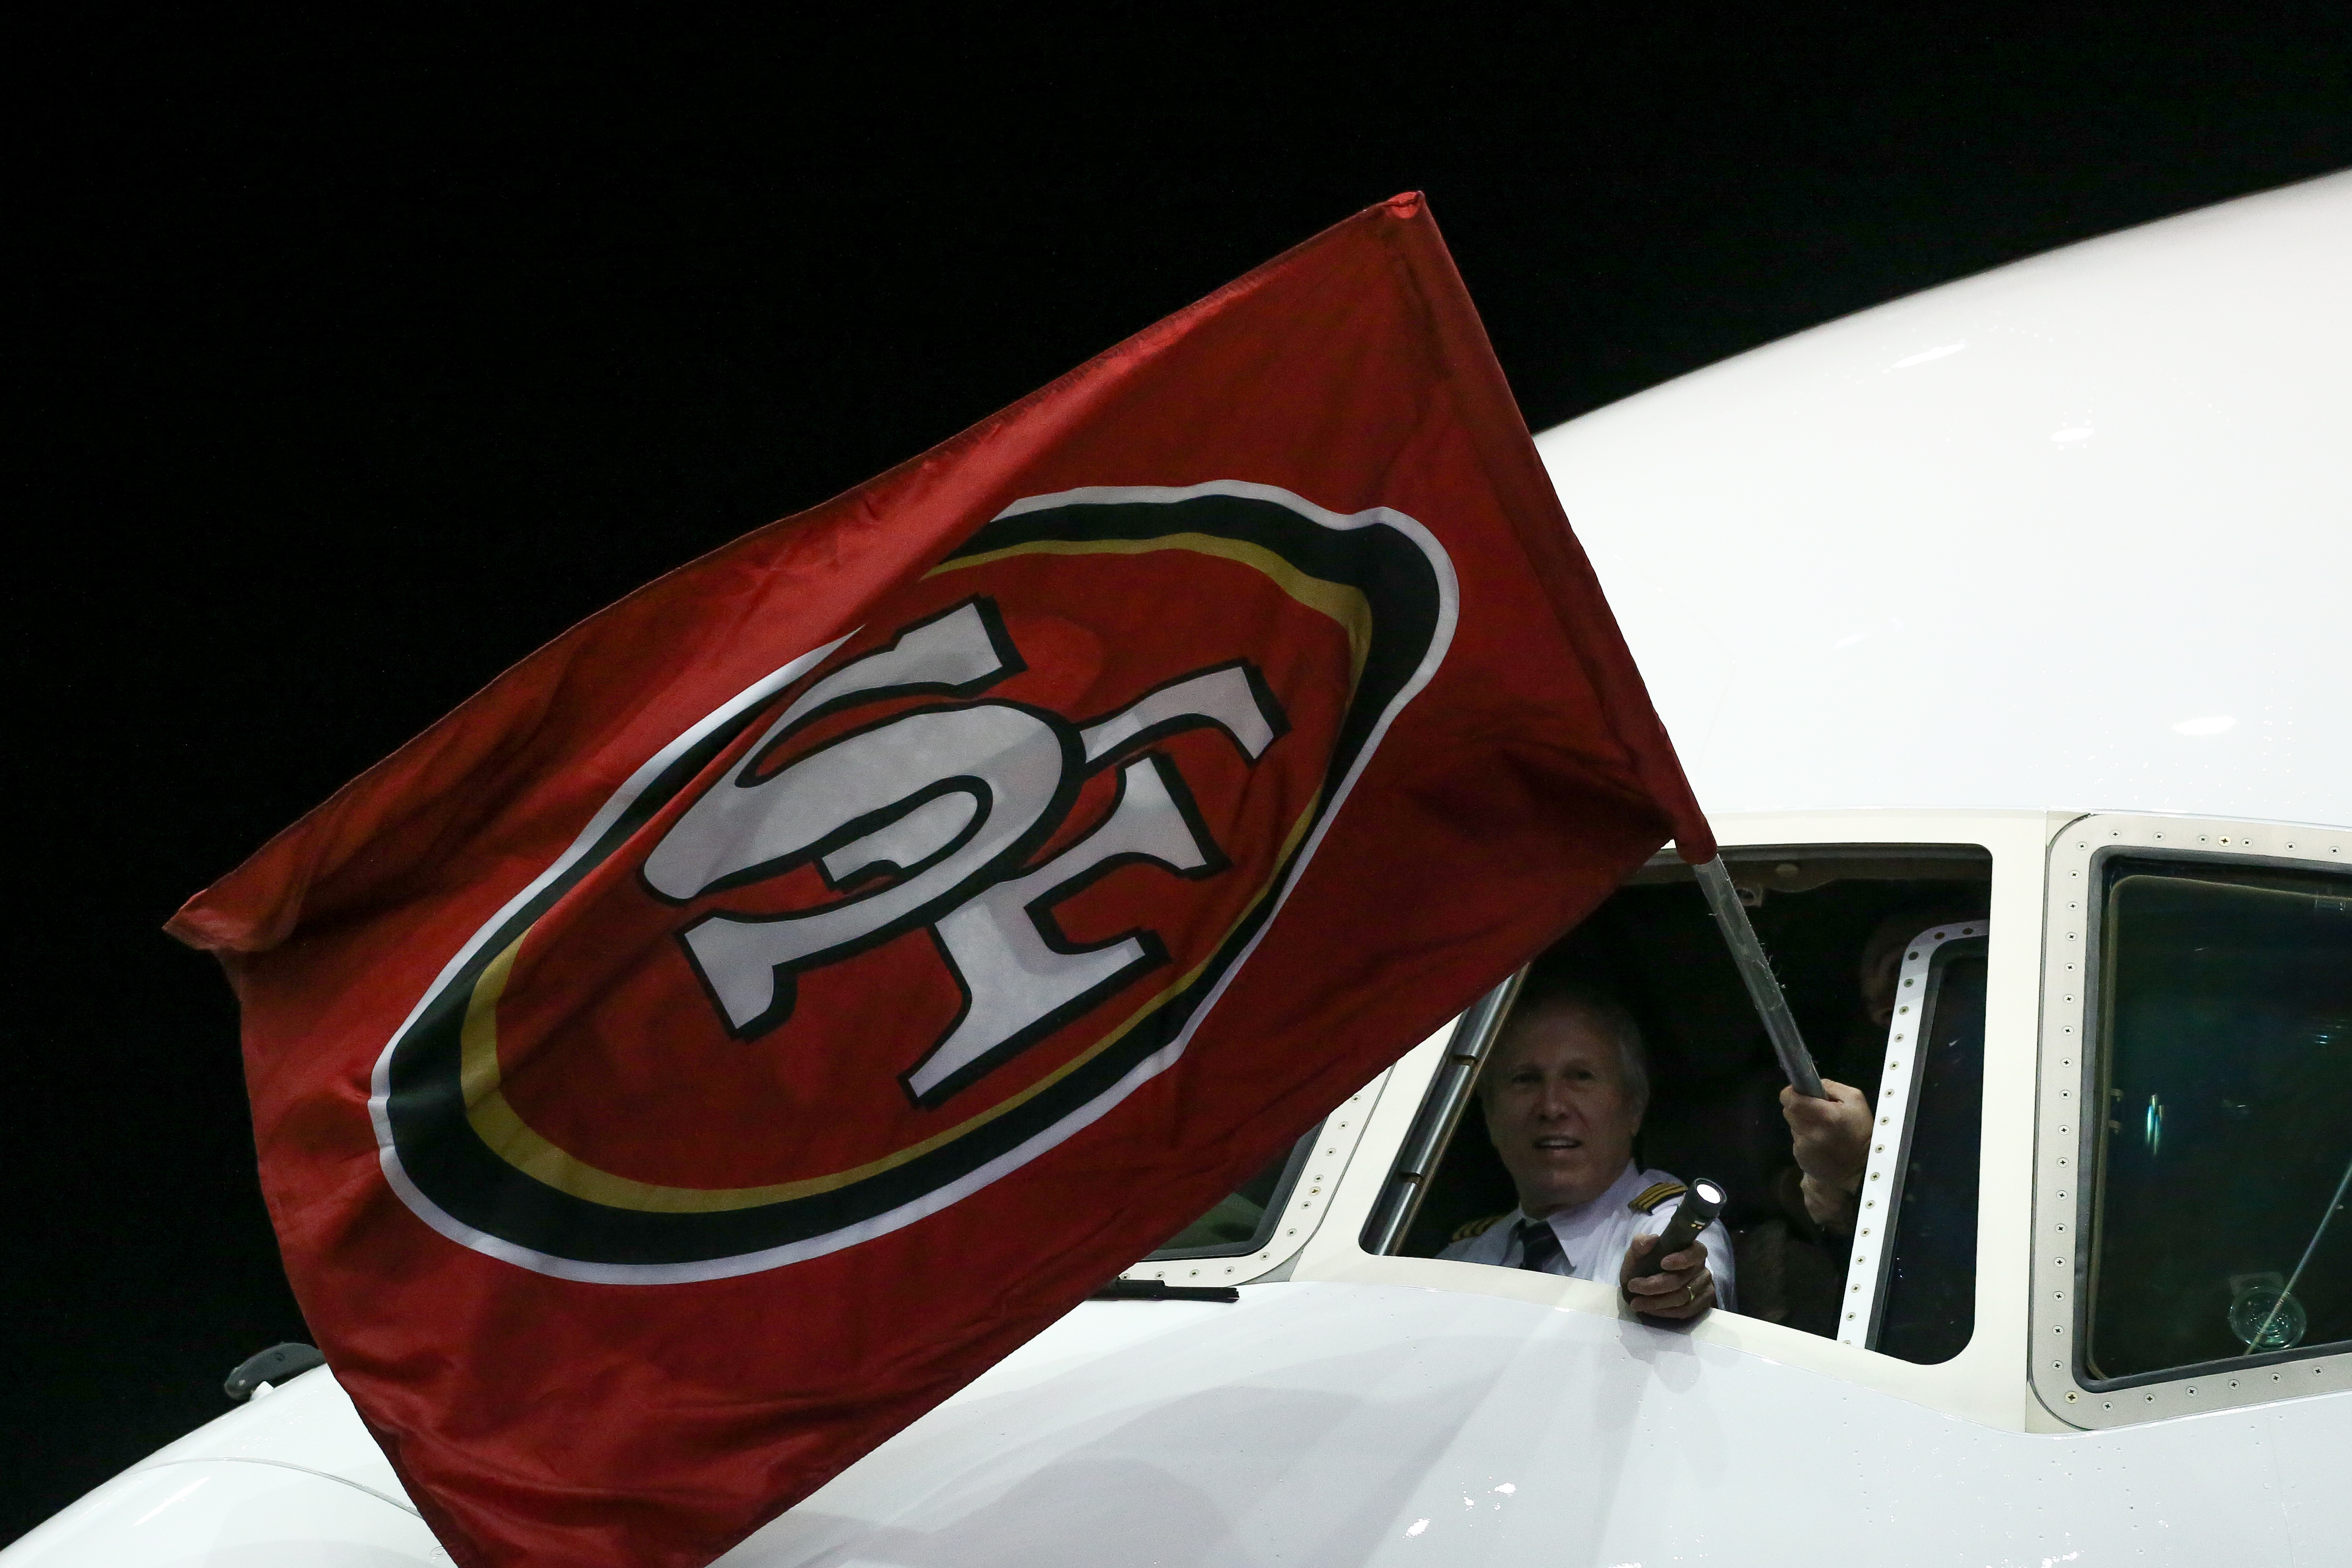 NFL: JAN 26 Super Bowl LIV - San Francisco 49ers Arrival